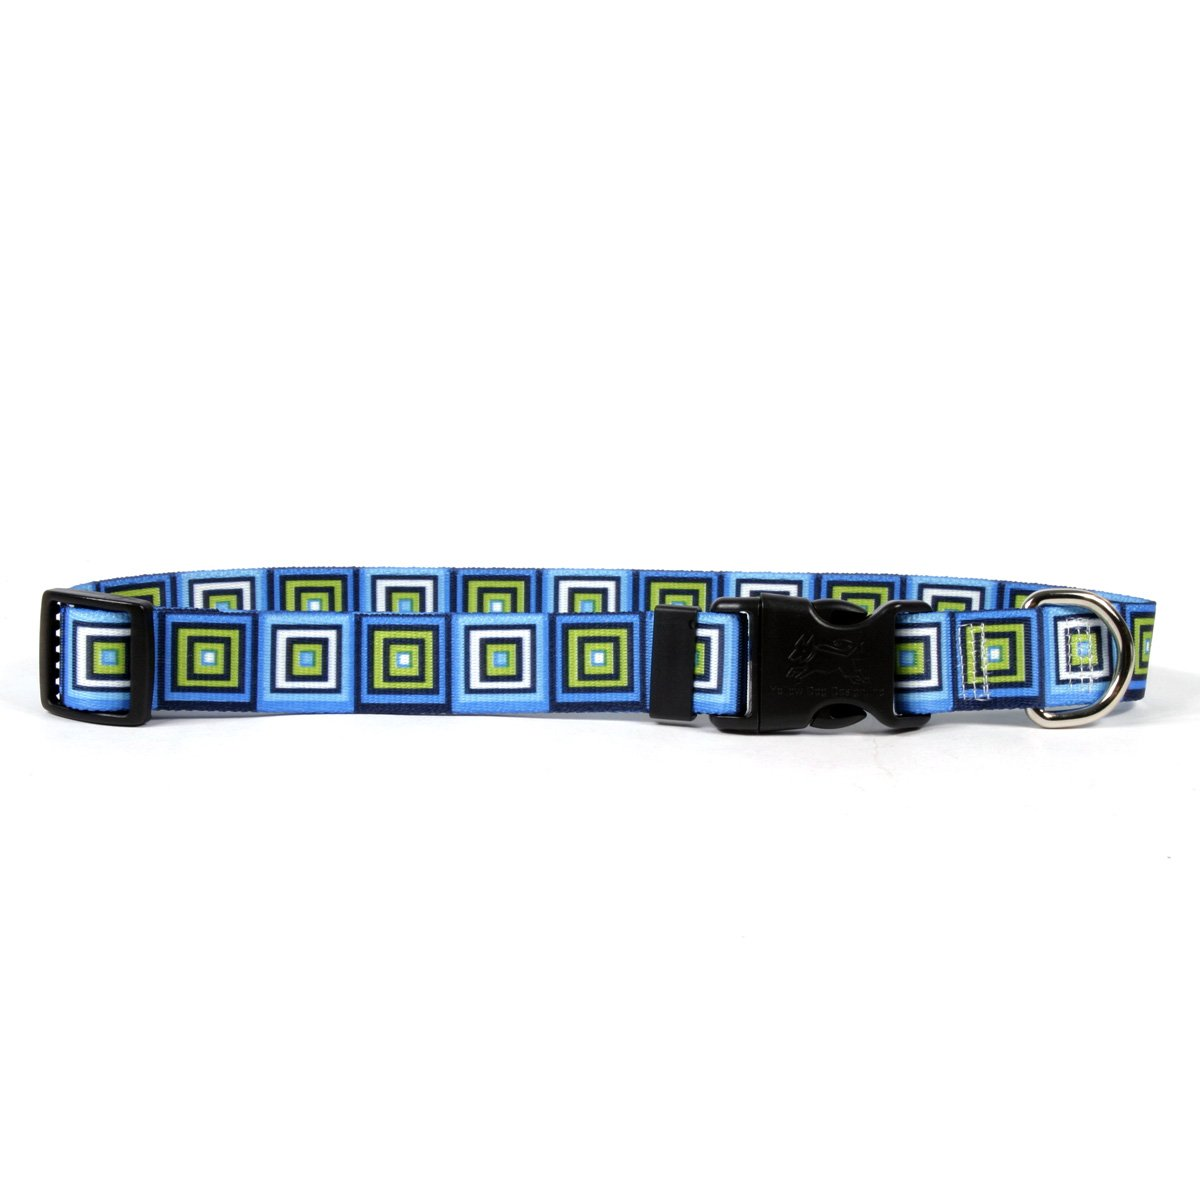 Yellow Dog Design Blue Blocks Dog Collar Fits Neck 14 to 20'', Medium 1'' Wide